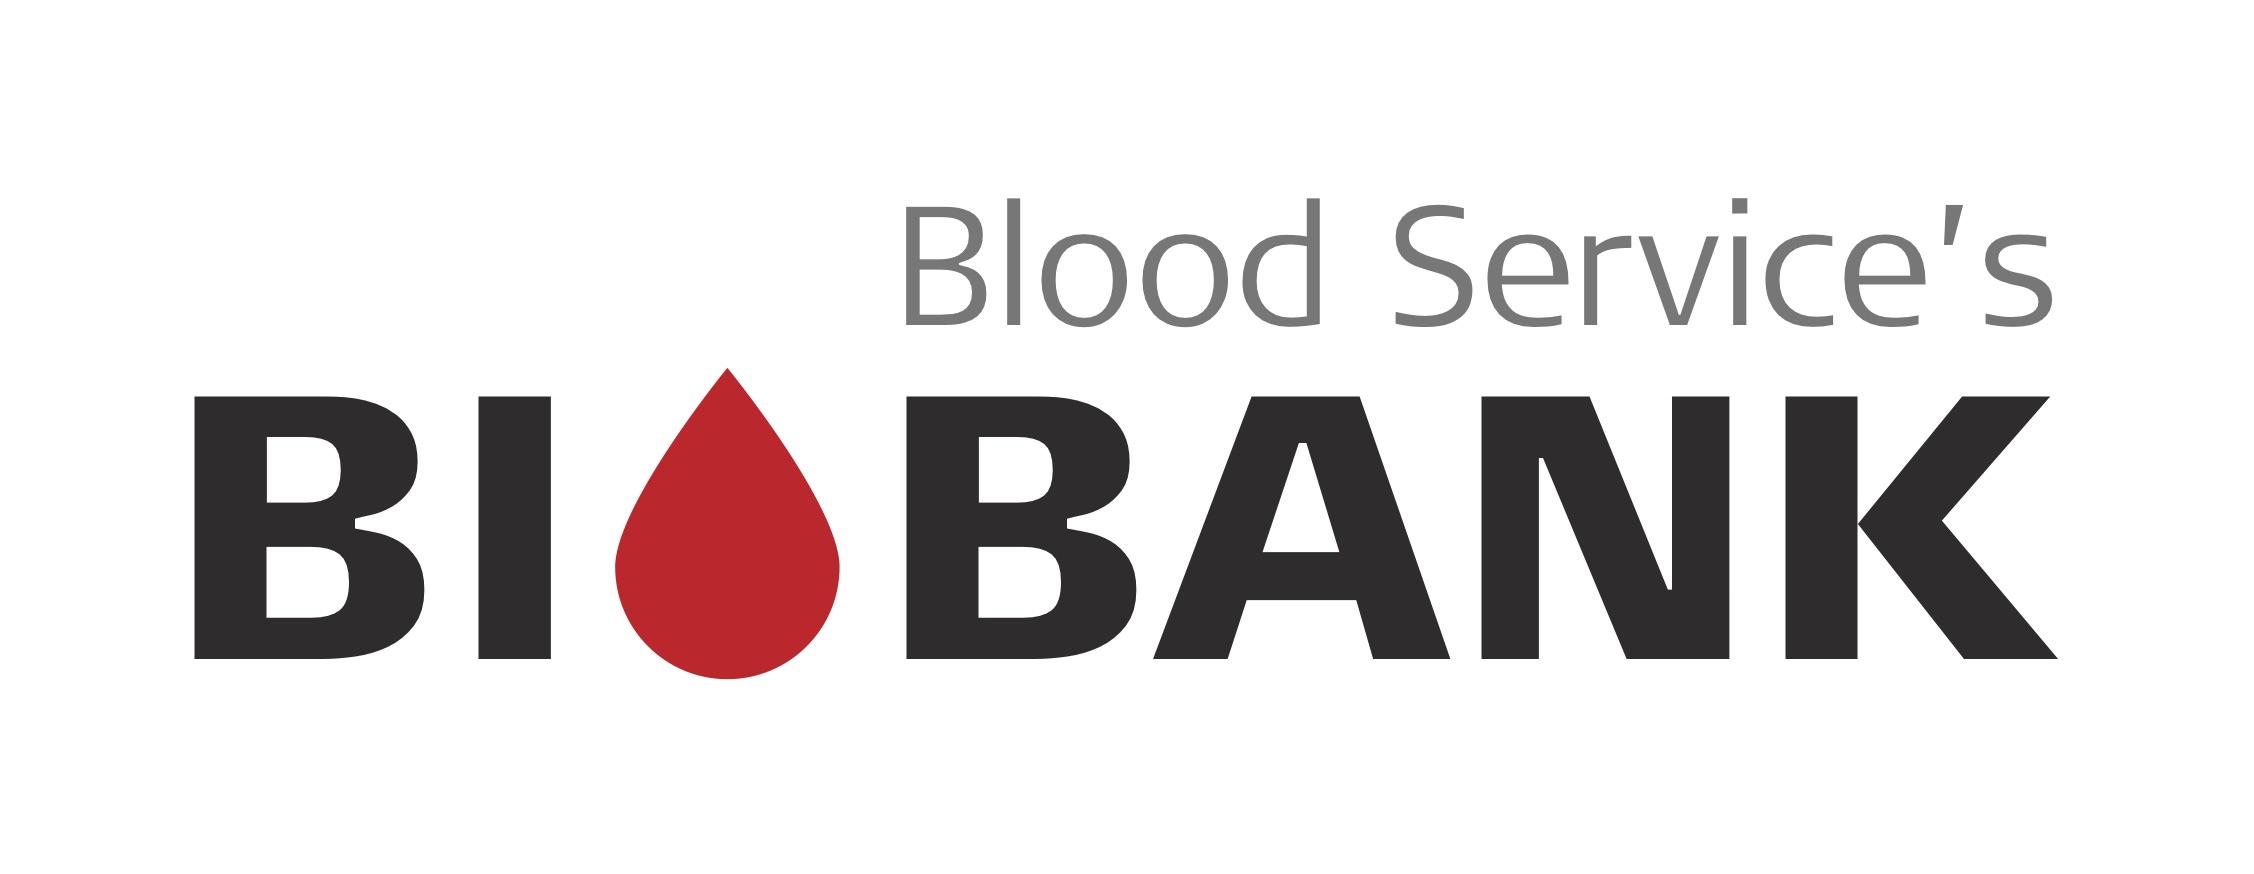 Blood Service's Biobank